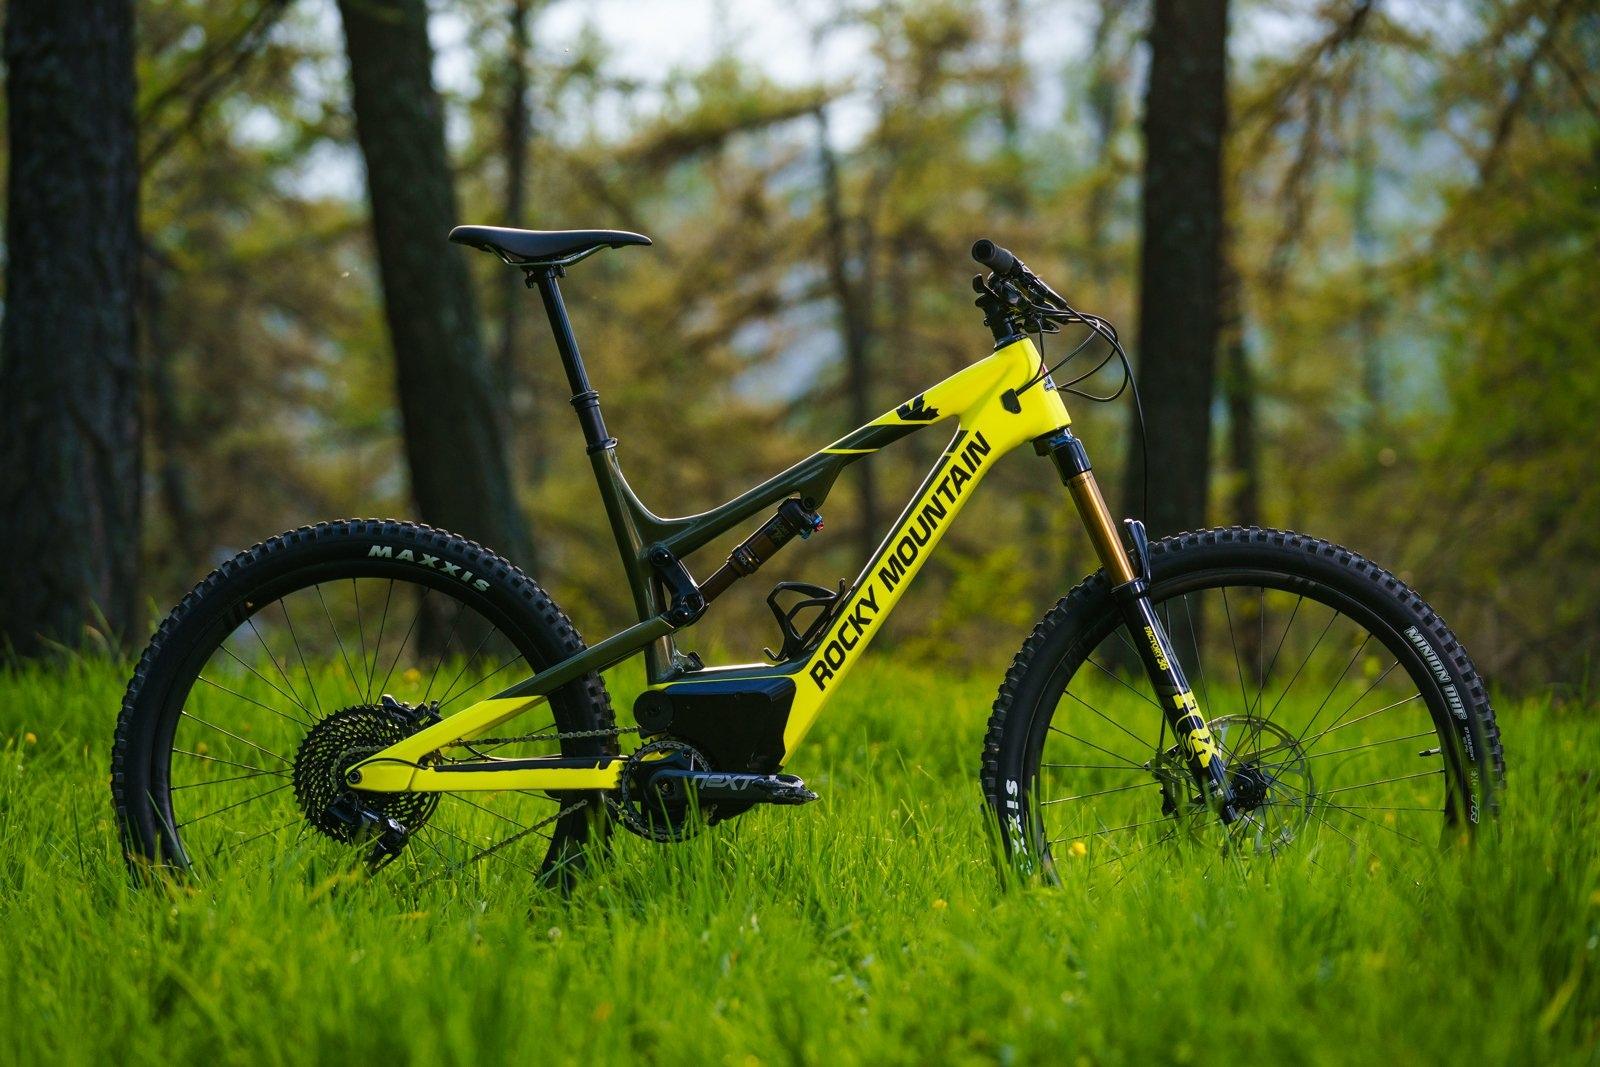 один картинка горного велосипеда значительно снизит риски